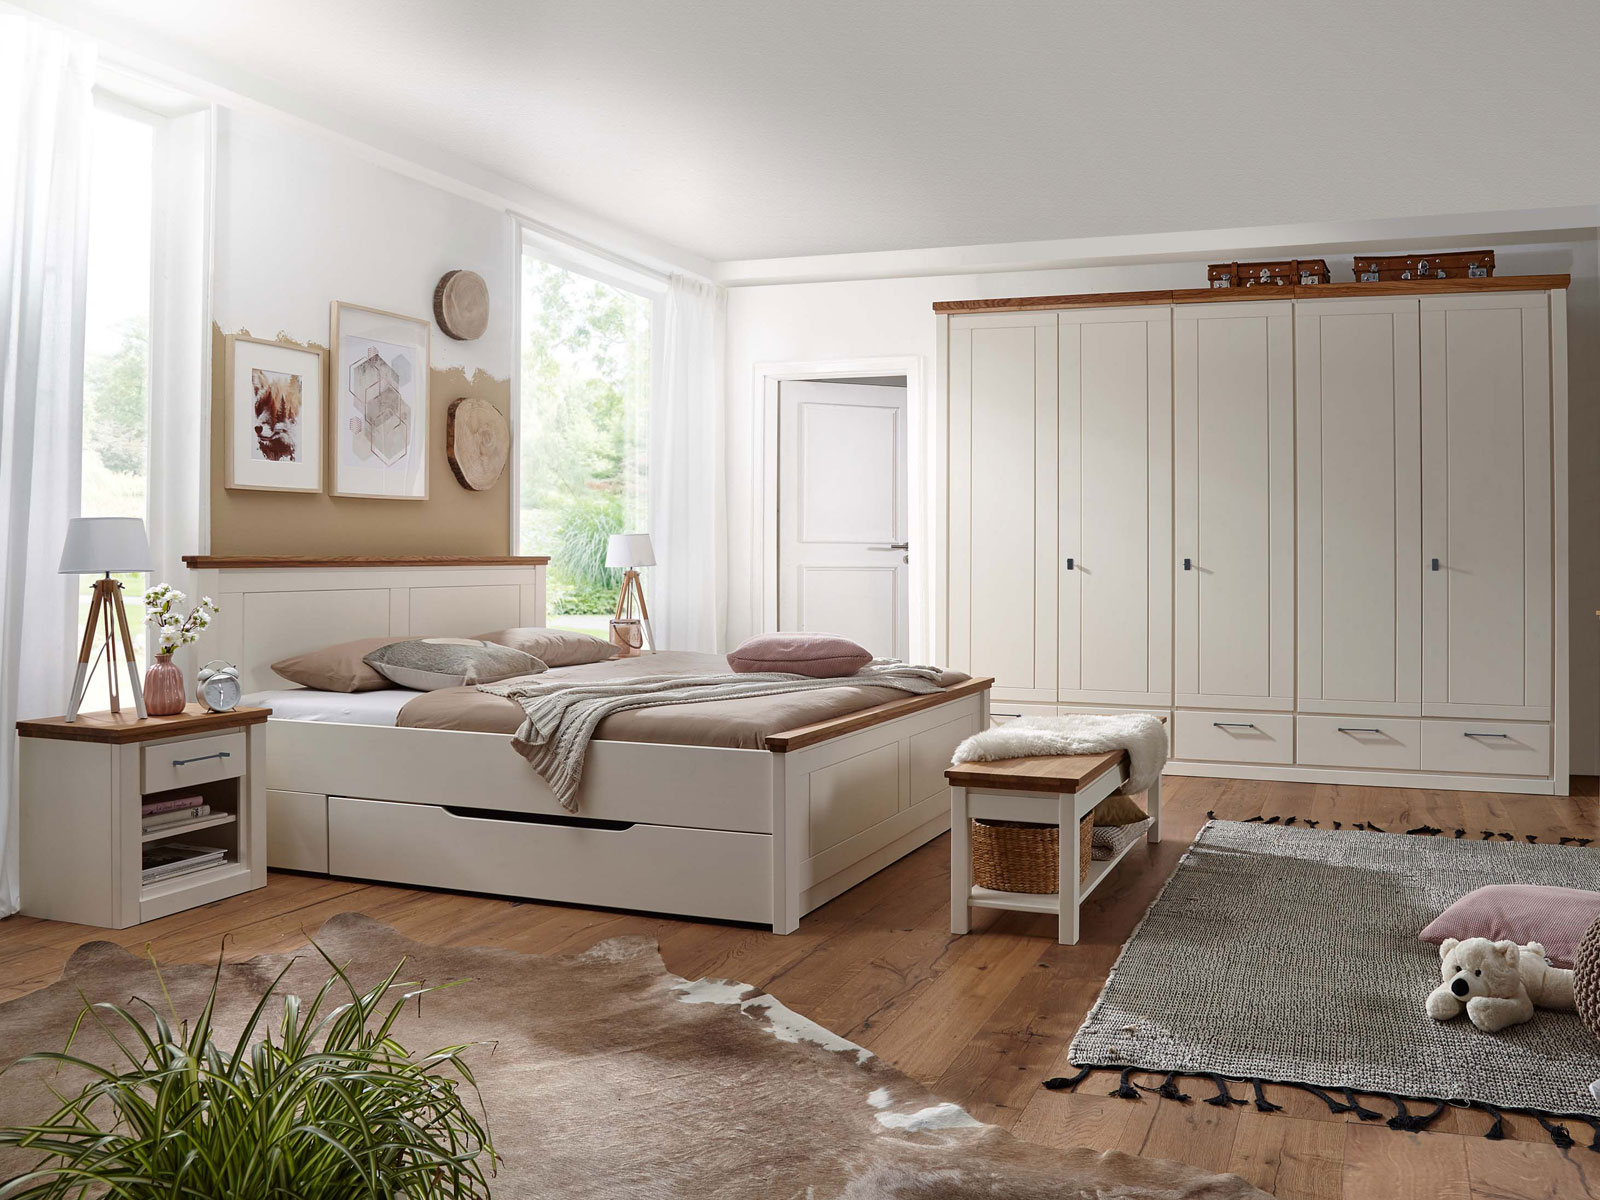 Schlafzimmer Komplett Provence Bett Kleiderschrank